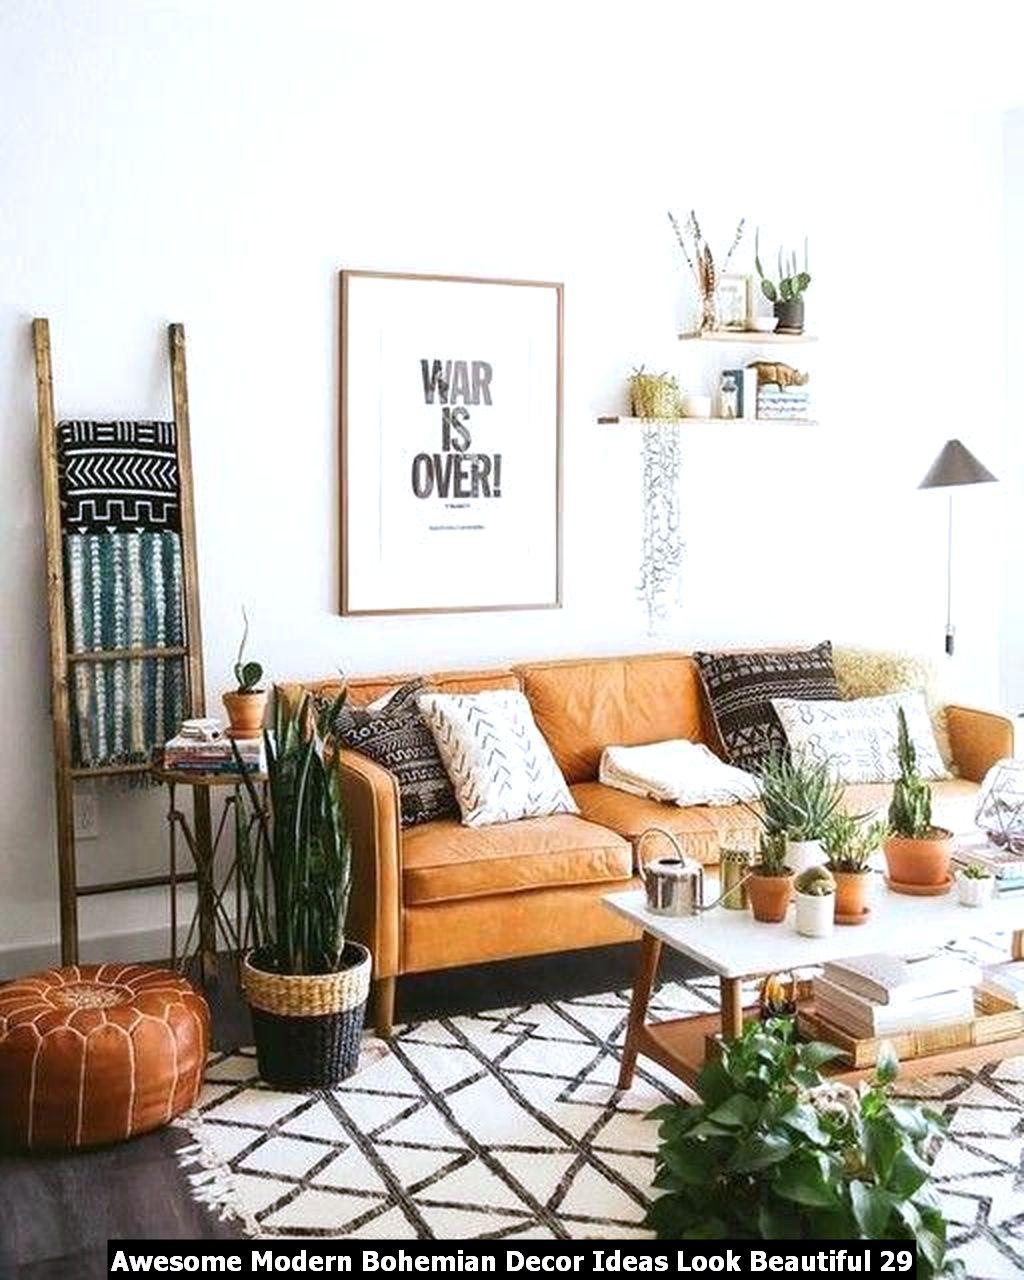 Awesome Modern Bohemian Decor Ideas Look Beautiful 29